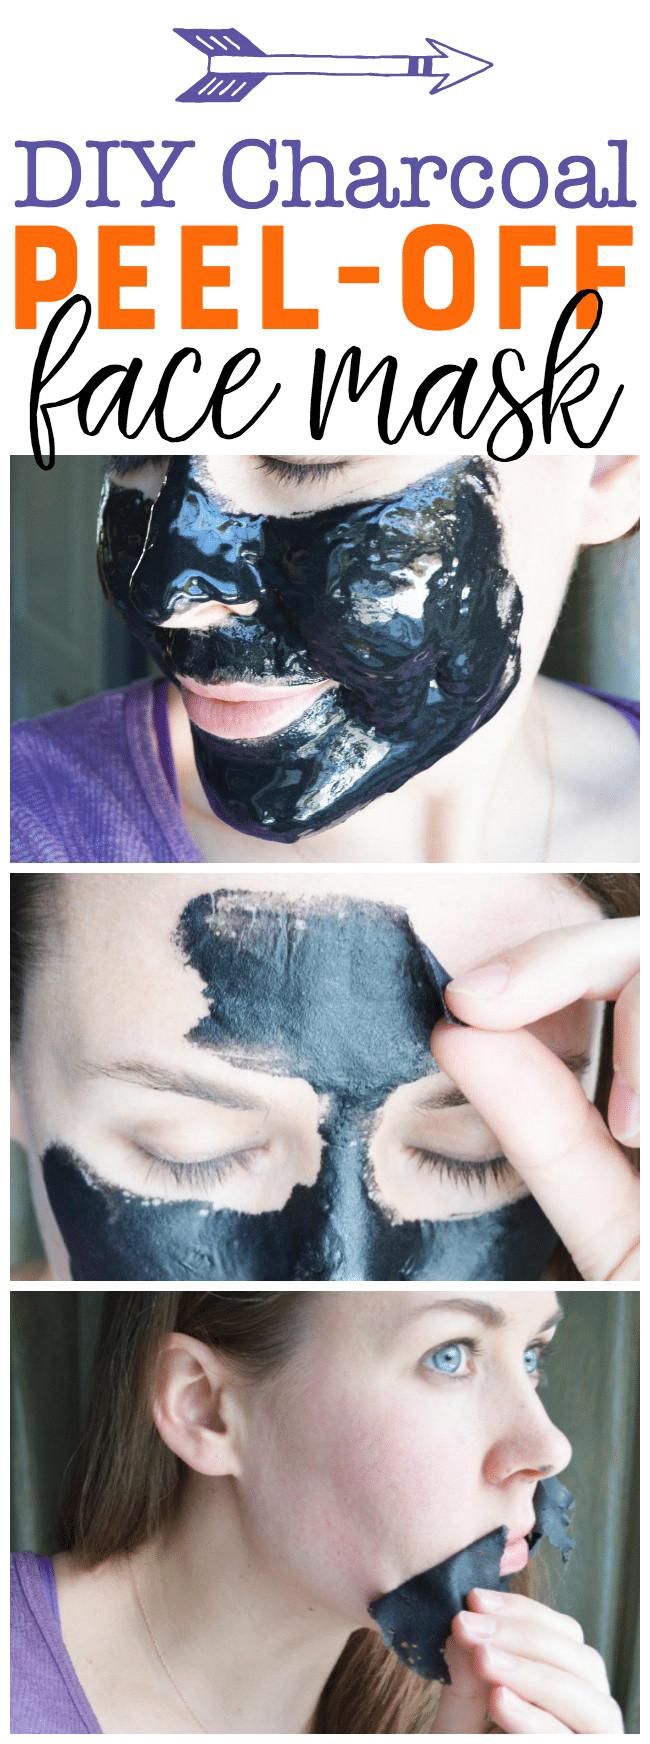 DIY Peel Mask  DIY Charcoal Peel f Mask Easy Blackhead Busting Mask